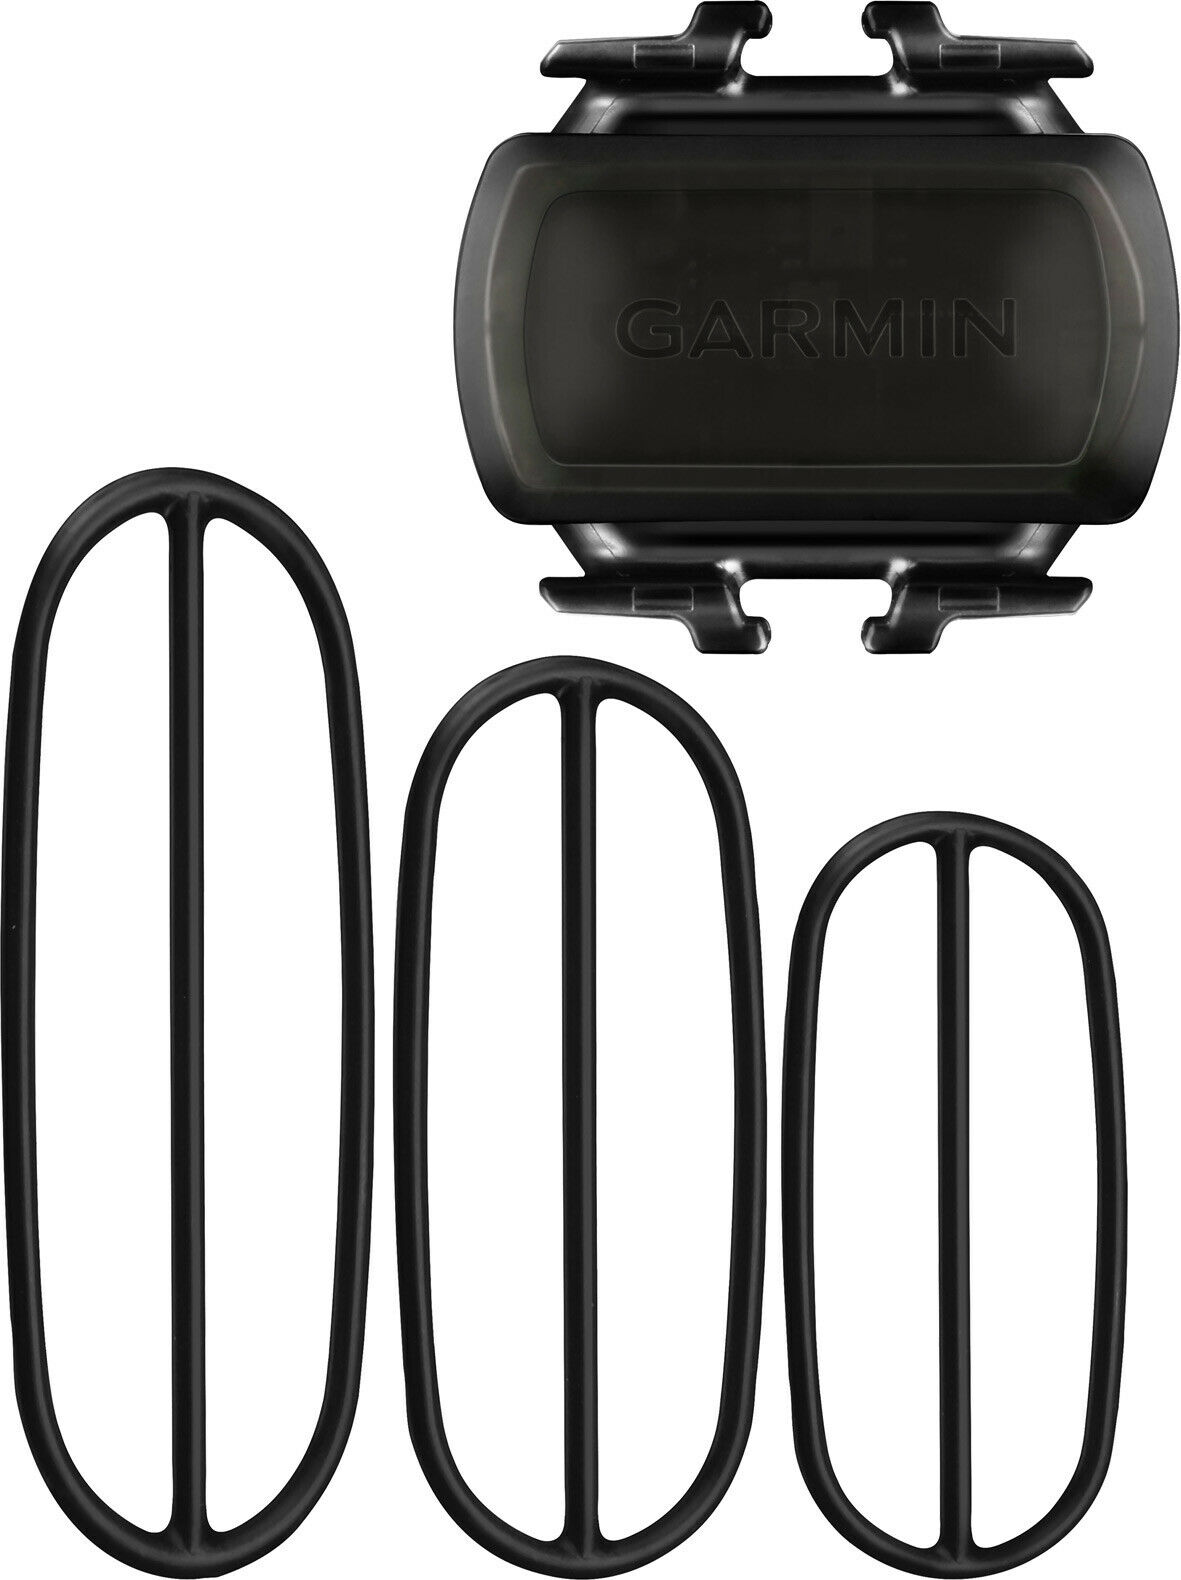 Bicicleta Garmin Sensor De Cadencia-Manivela montado